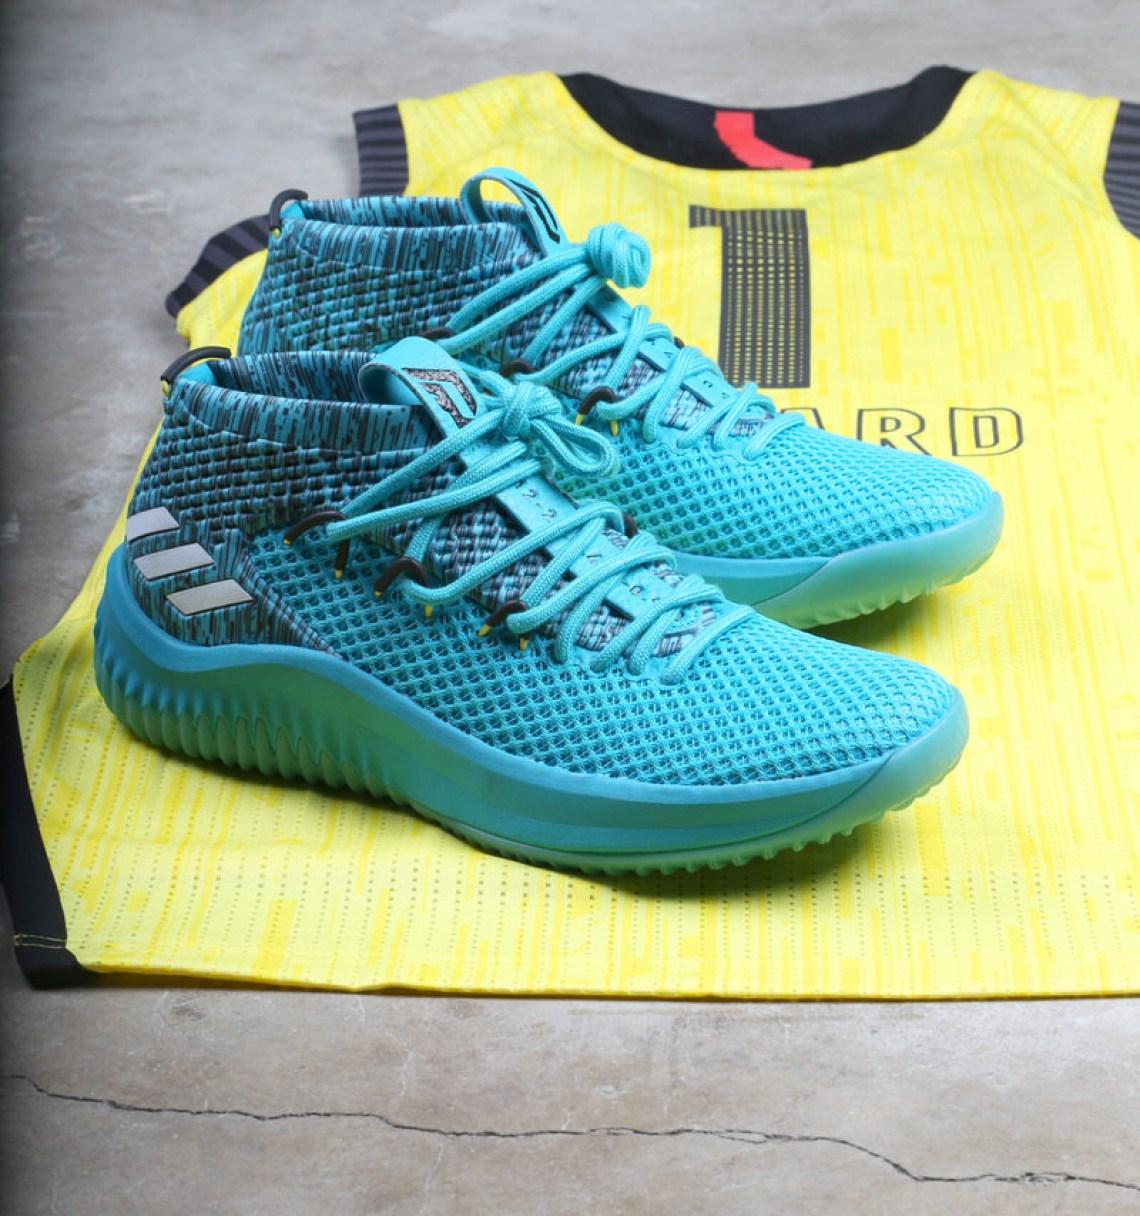 Damian Lillard s Berry Blast-themed Adidas Dame 4 For The Powerade ... 96969173f